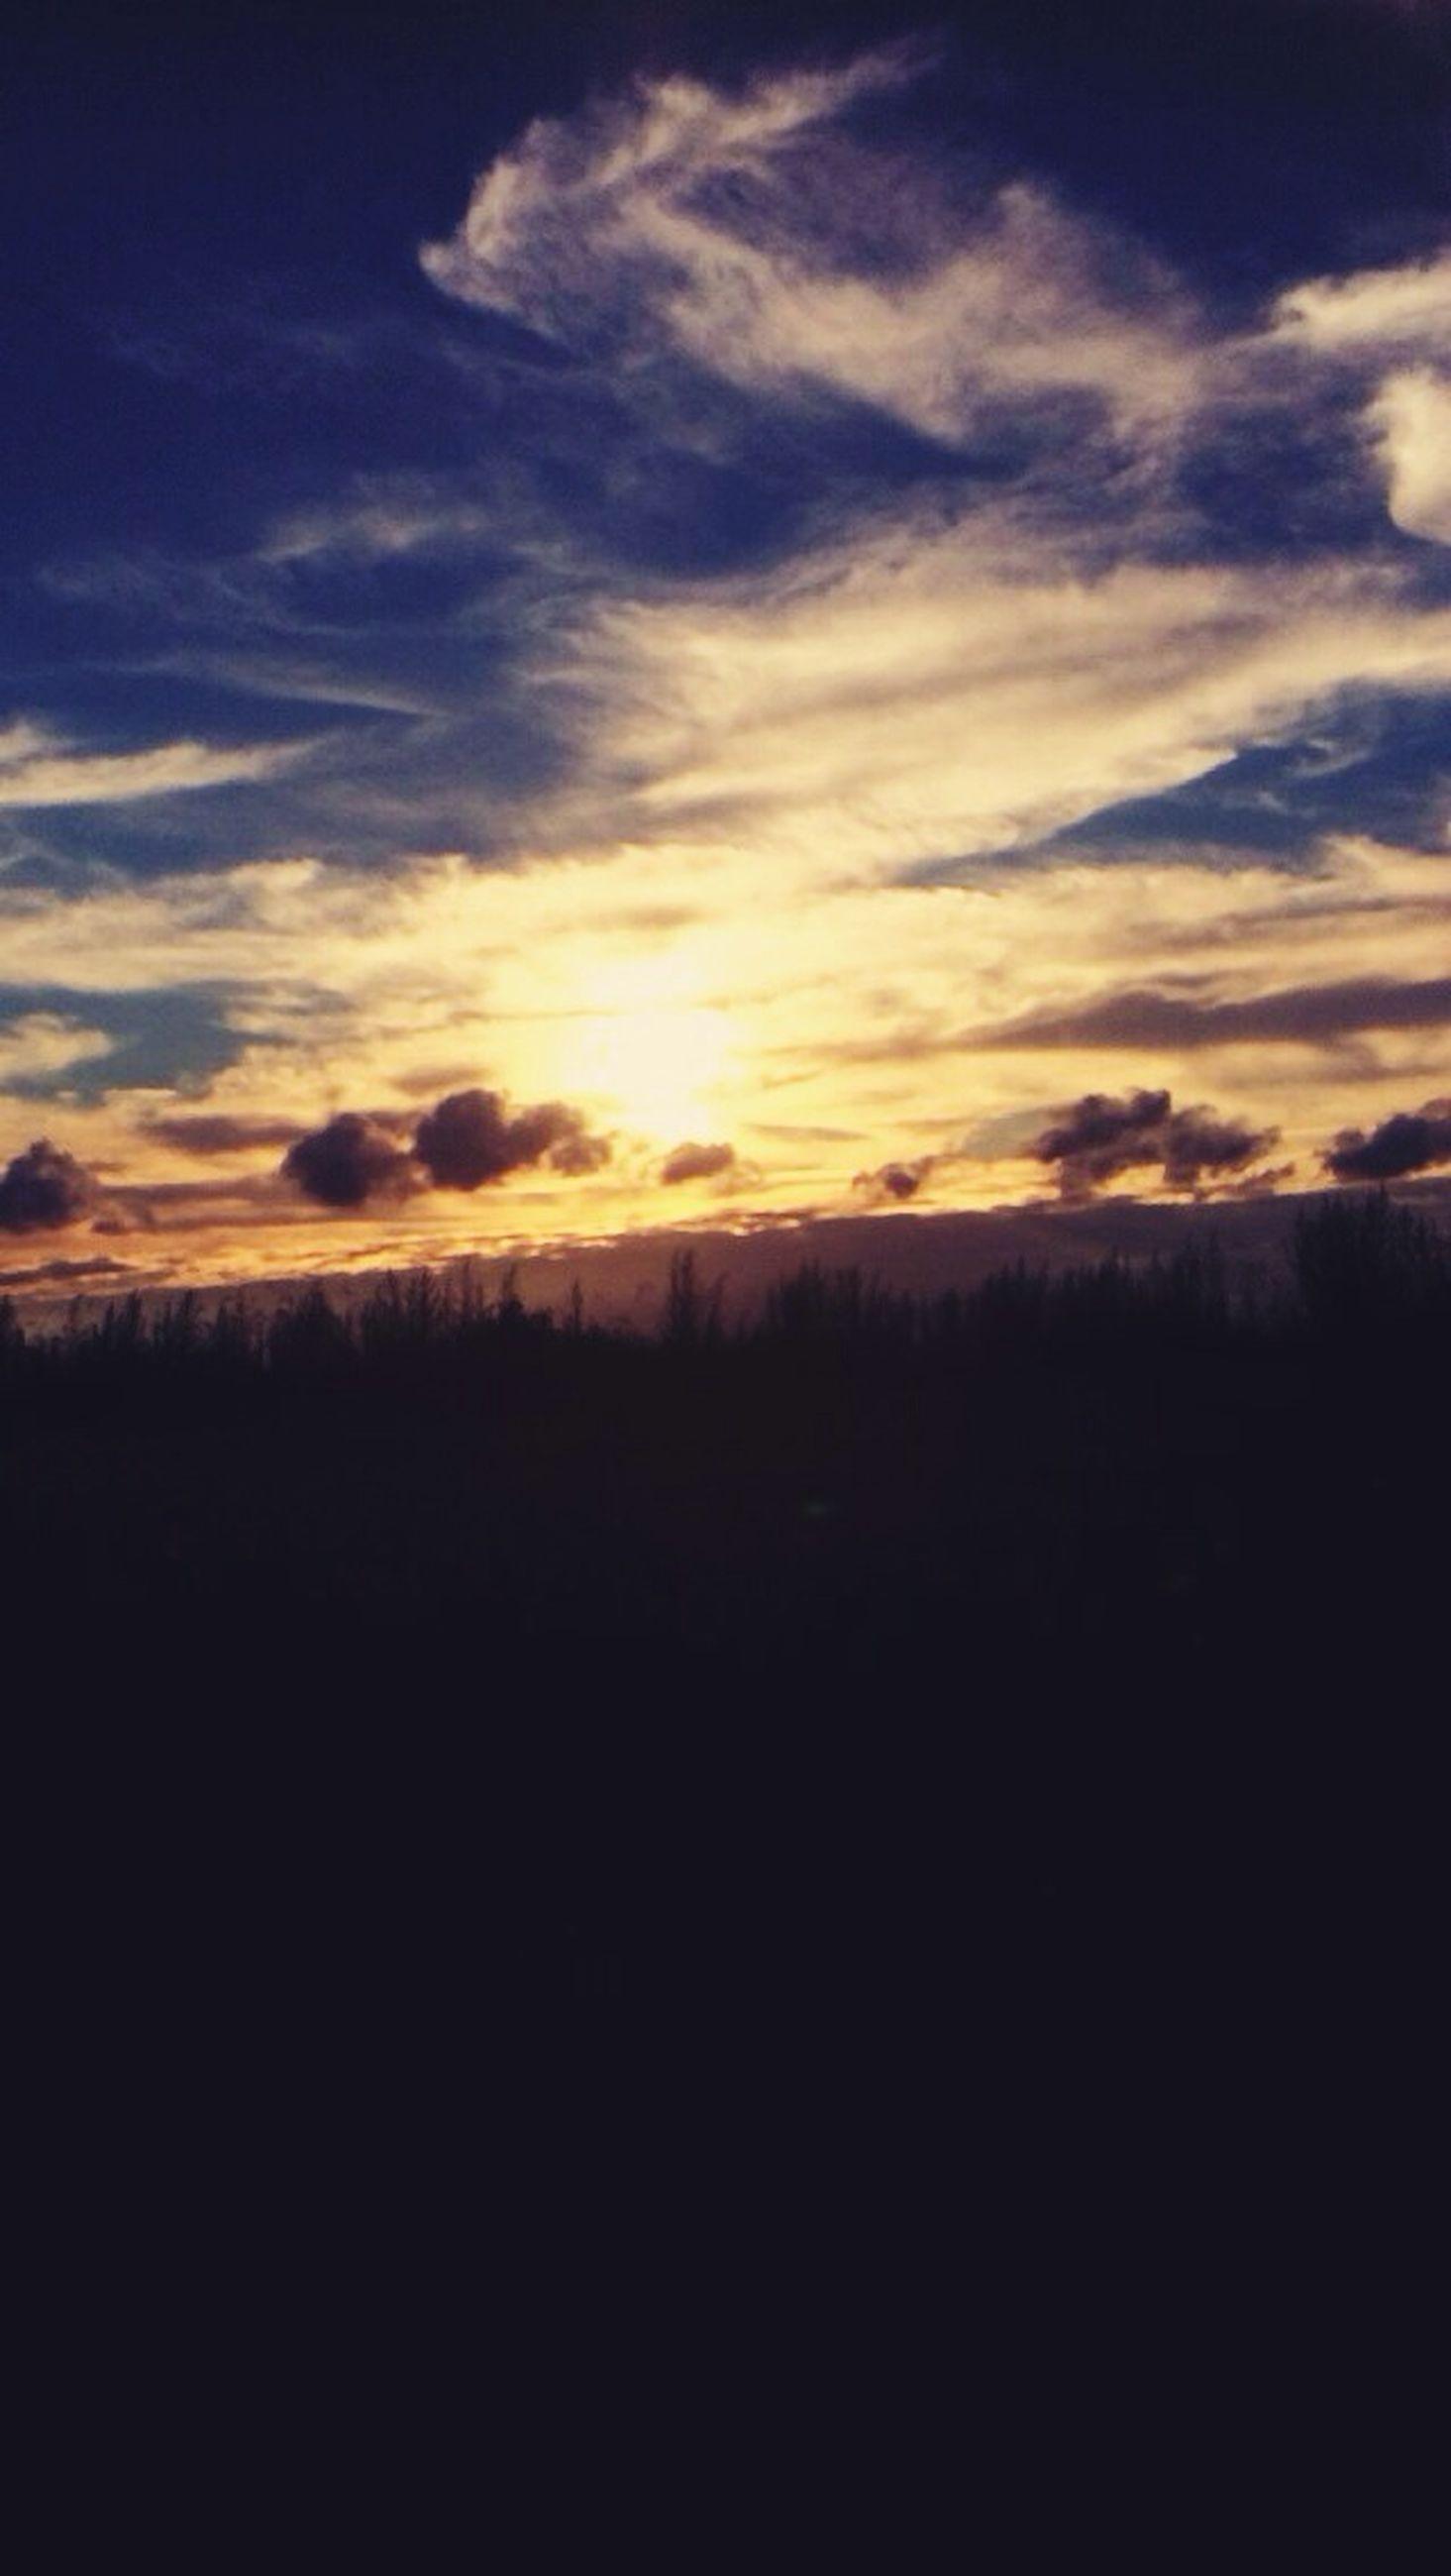 sunset, tranquil scene, silhouette, scenics, tranquility, beauty in nature, sky, landscape, nature, idyllic, cloud - sky, orange color, field, cloud, outdoors, horizon over land, no people, dark, non-urban scene, copy space